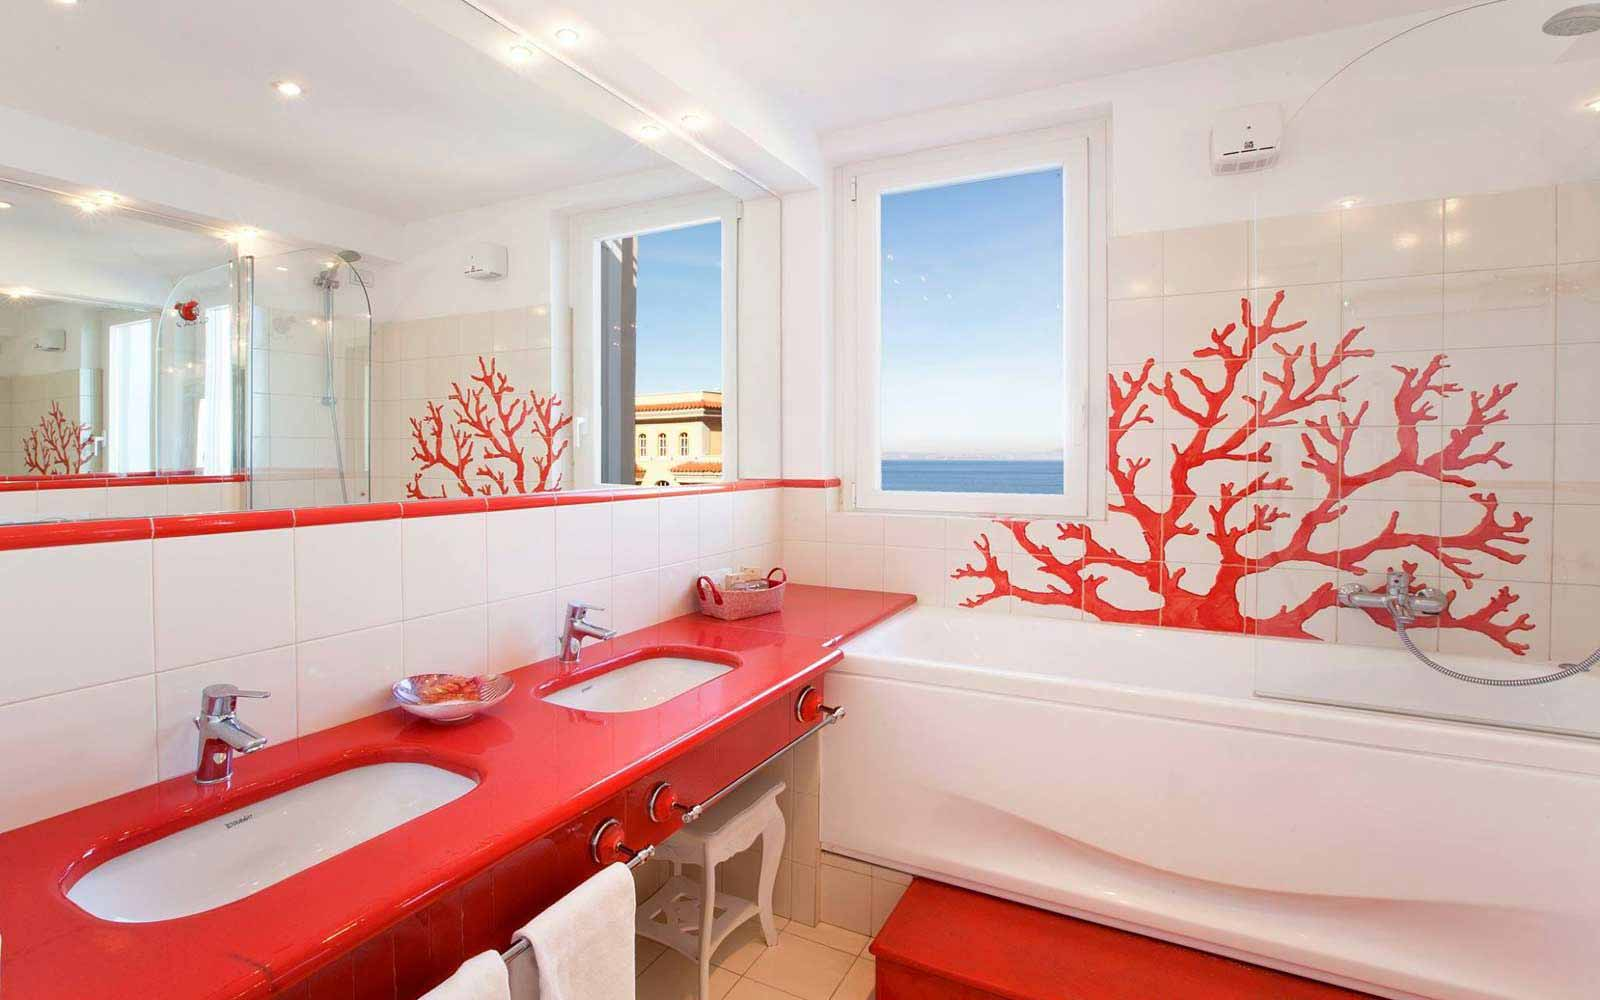 Bathroom in a Suite at Hotel Corallo